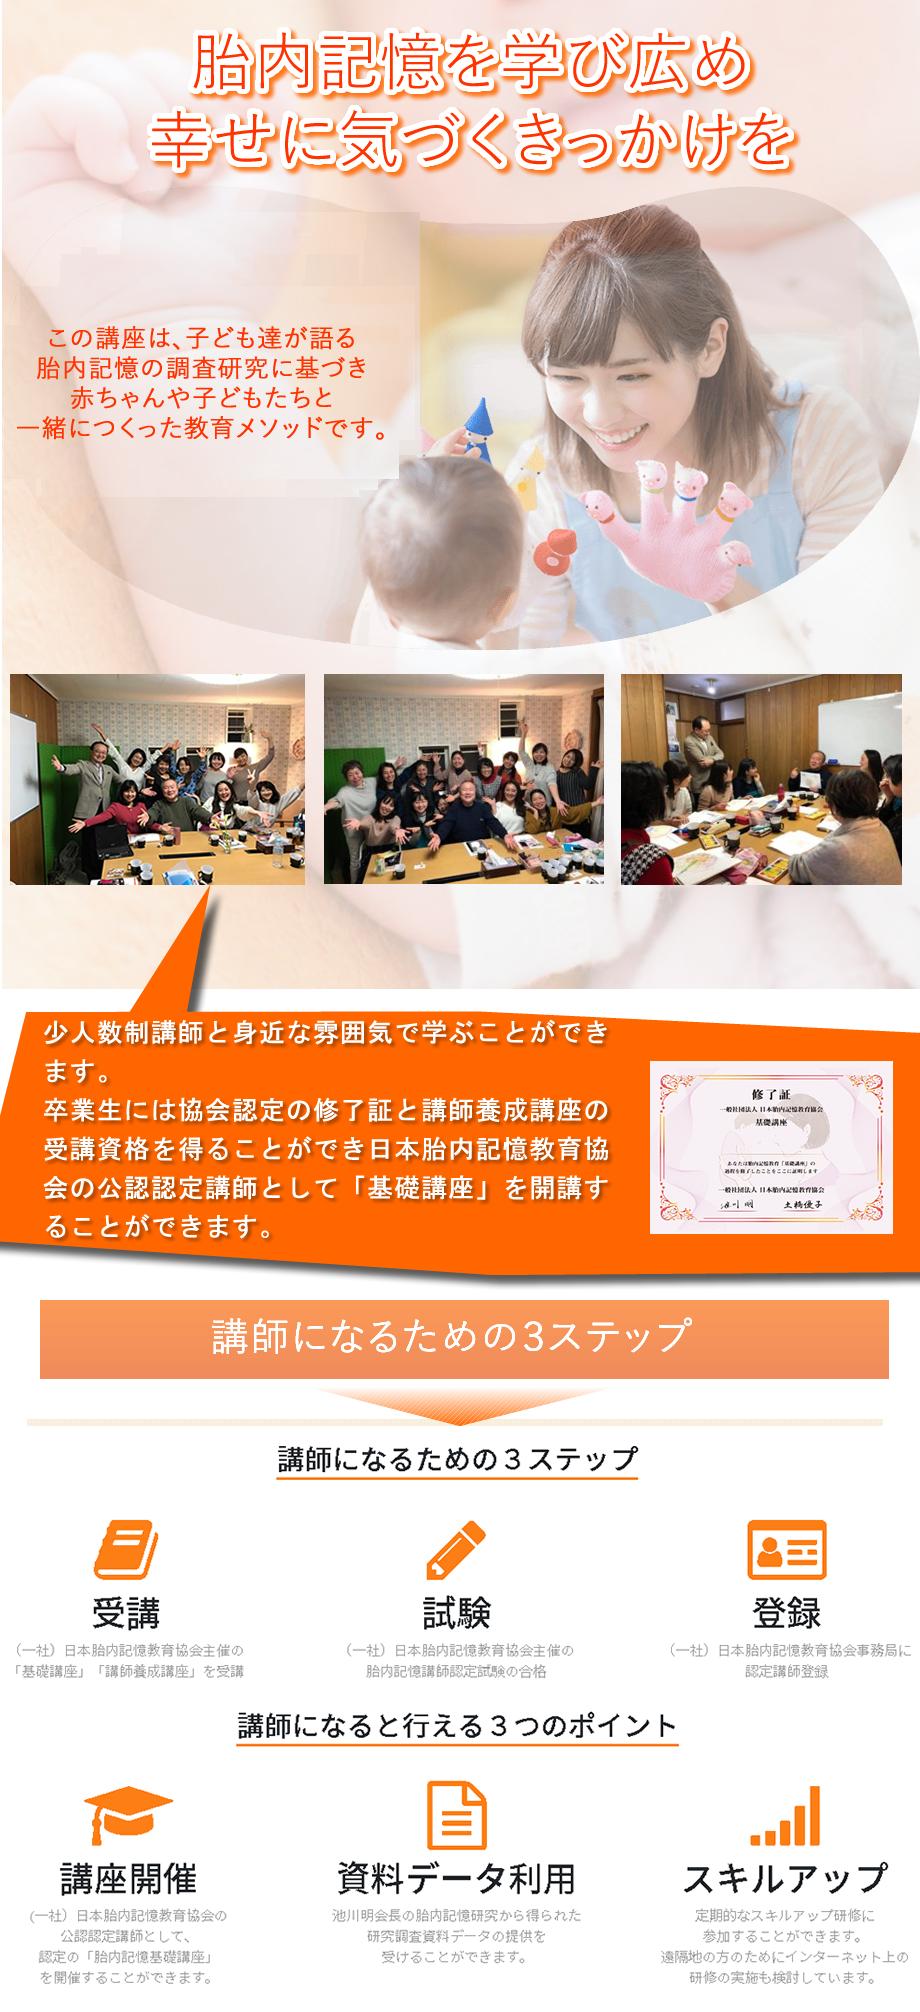 tainaikiokulp1 - 胎内記憶教育協会第4期基礎講座